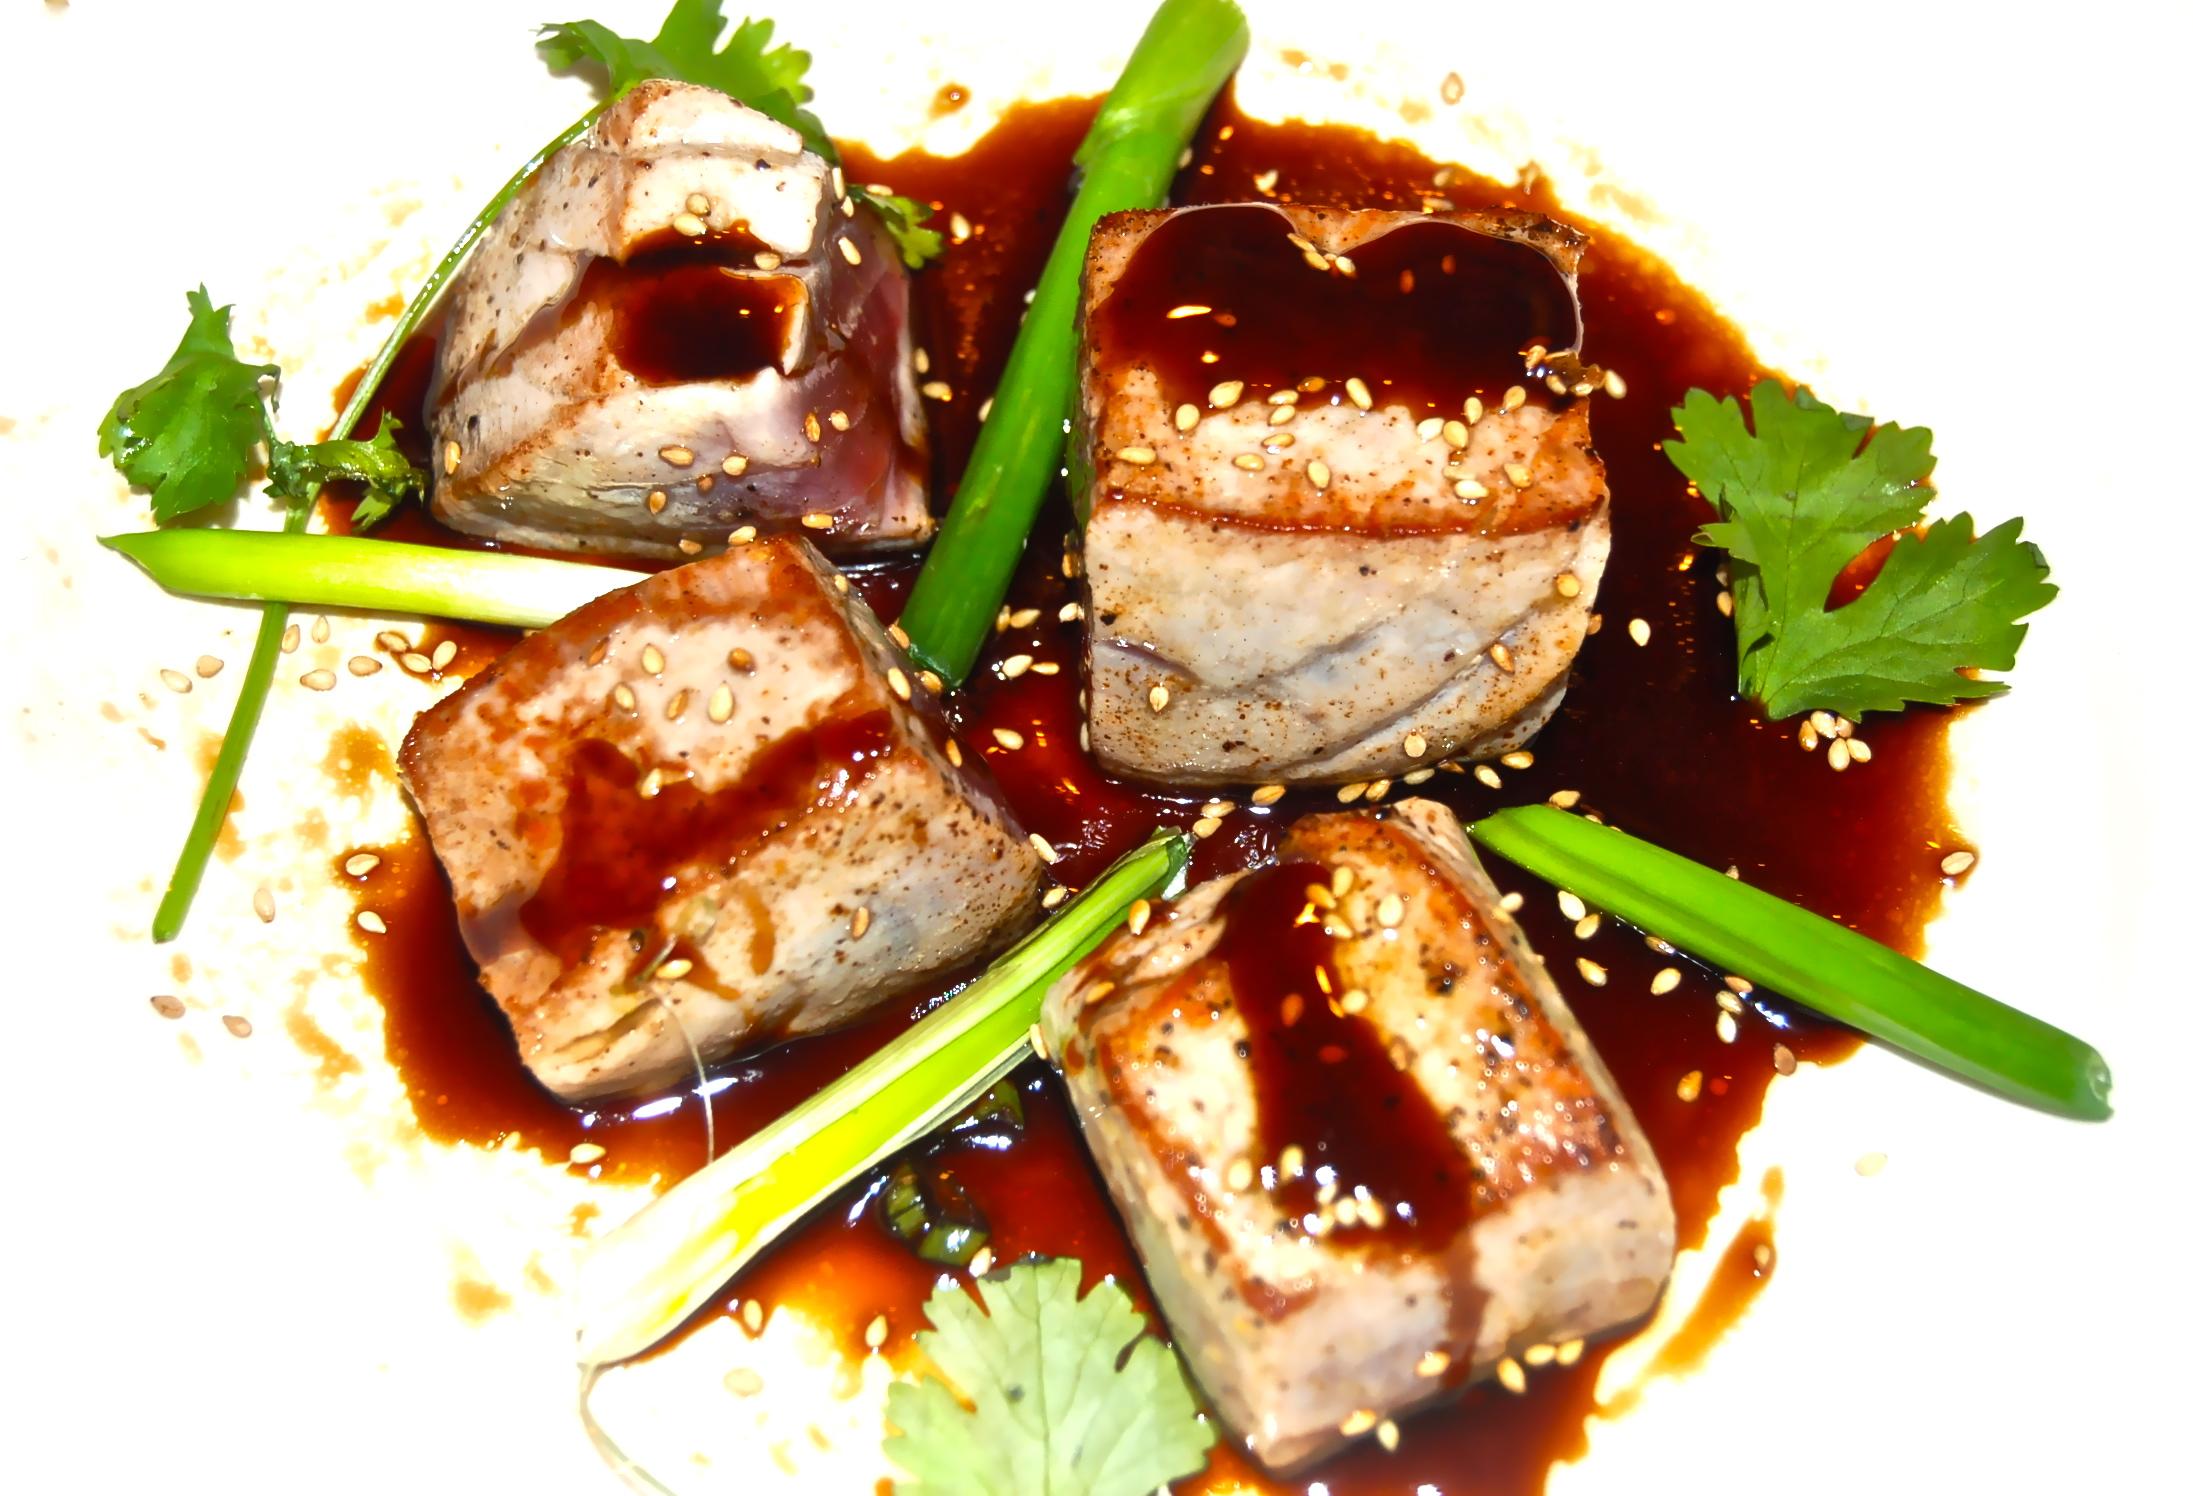 Sushi grade tuna recipes bing images for Sushi grade fish